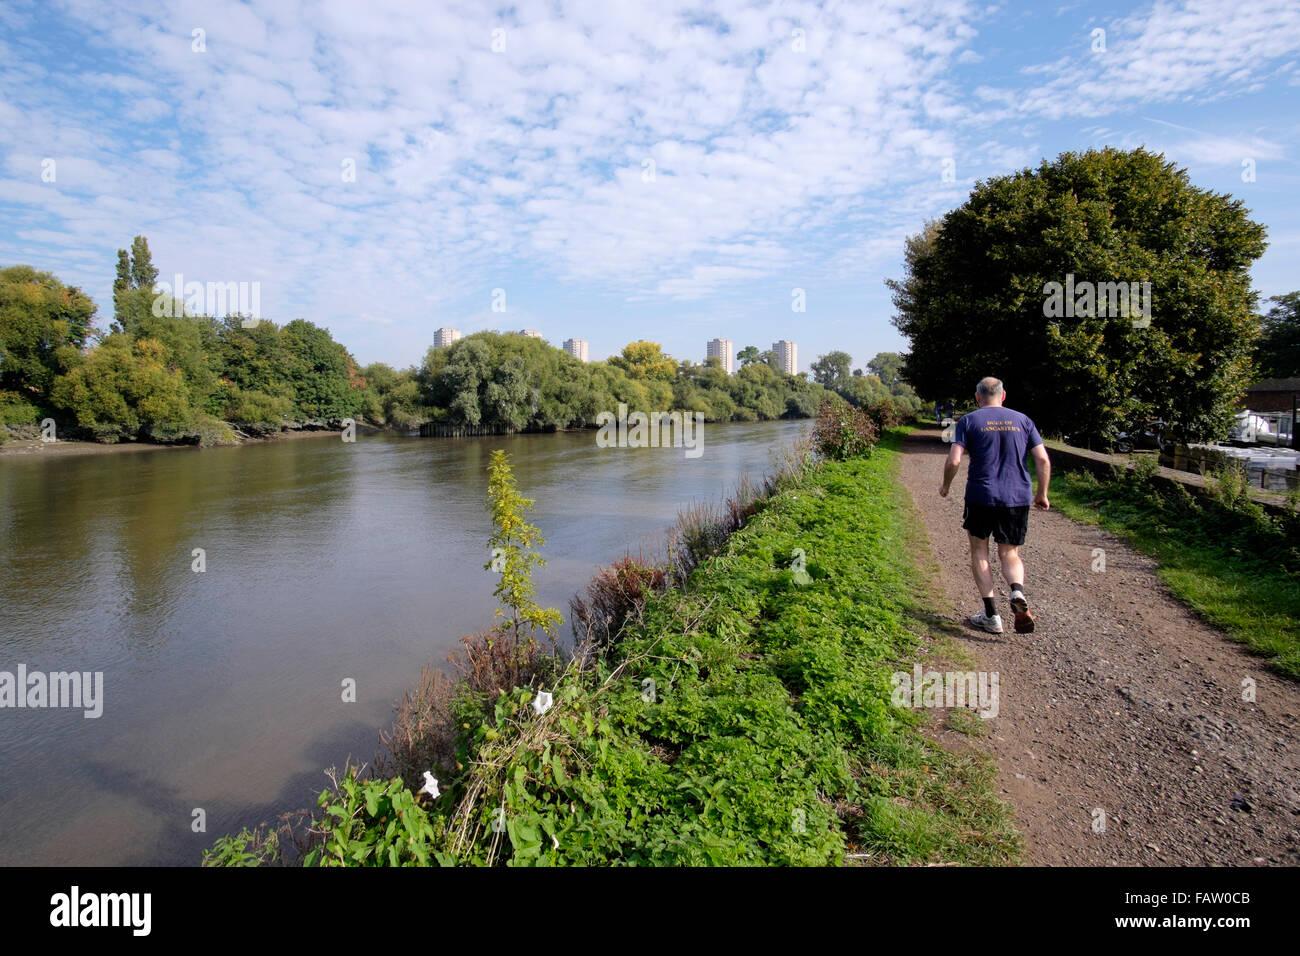 A senior man runs along the towpath towards Kew Bridge on the river Thames, London, England, UK - Stock Image